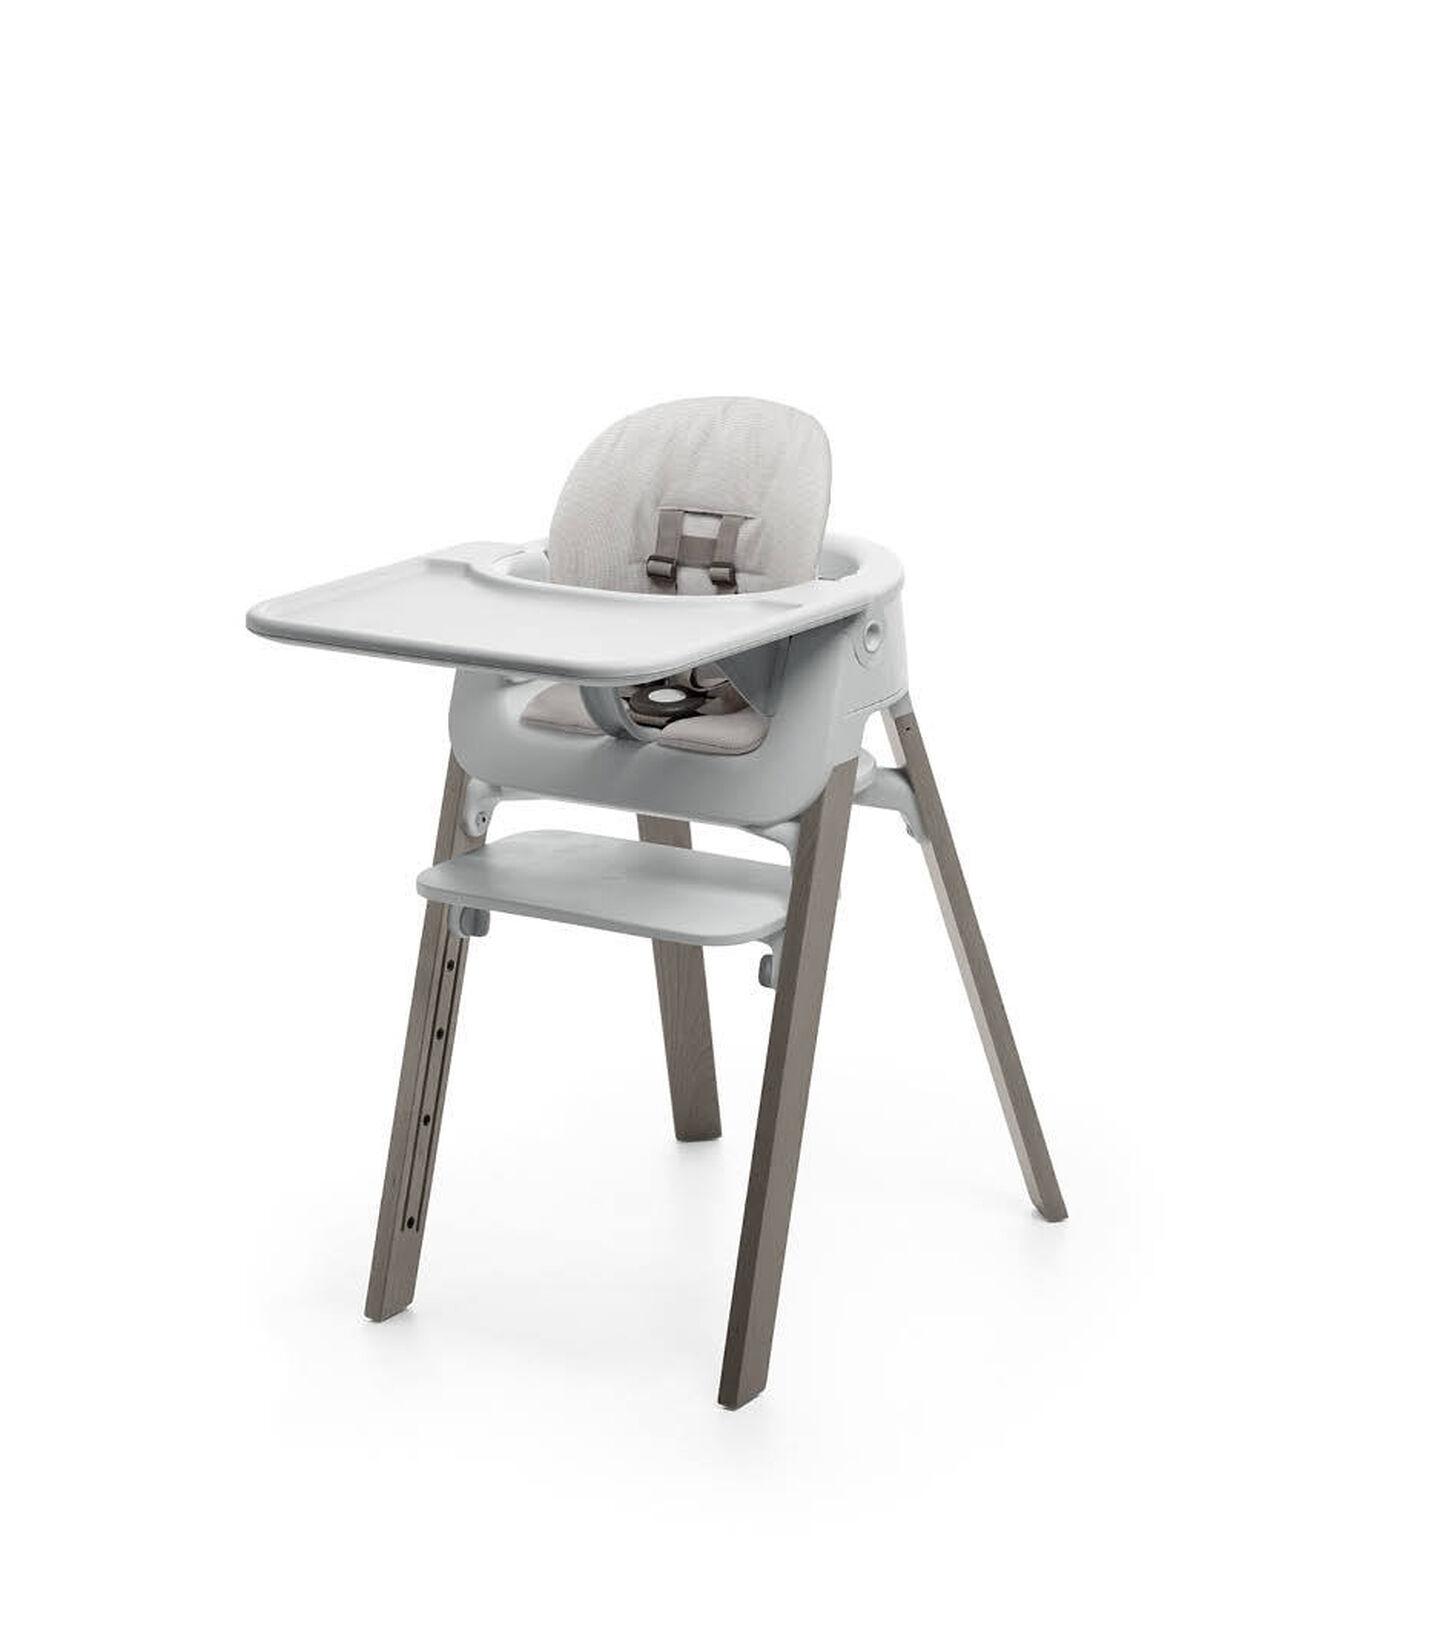 Stokke® Steps™ Hazy Grey with Accessories. Baby Set Light Grey. Baby Set Cushion Timeless Grey. Baby Set Tray Light Grey.